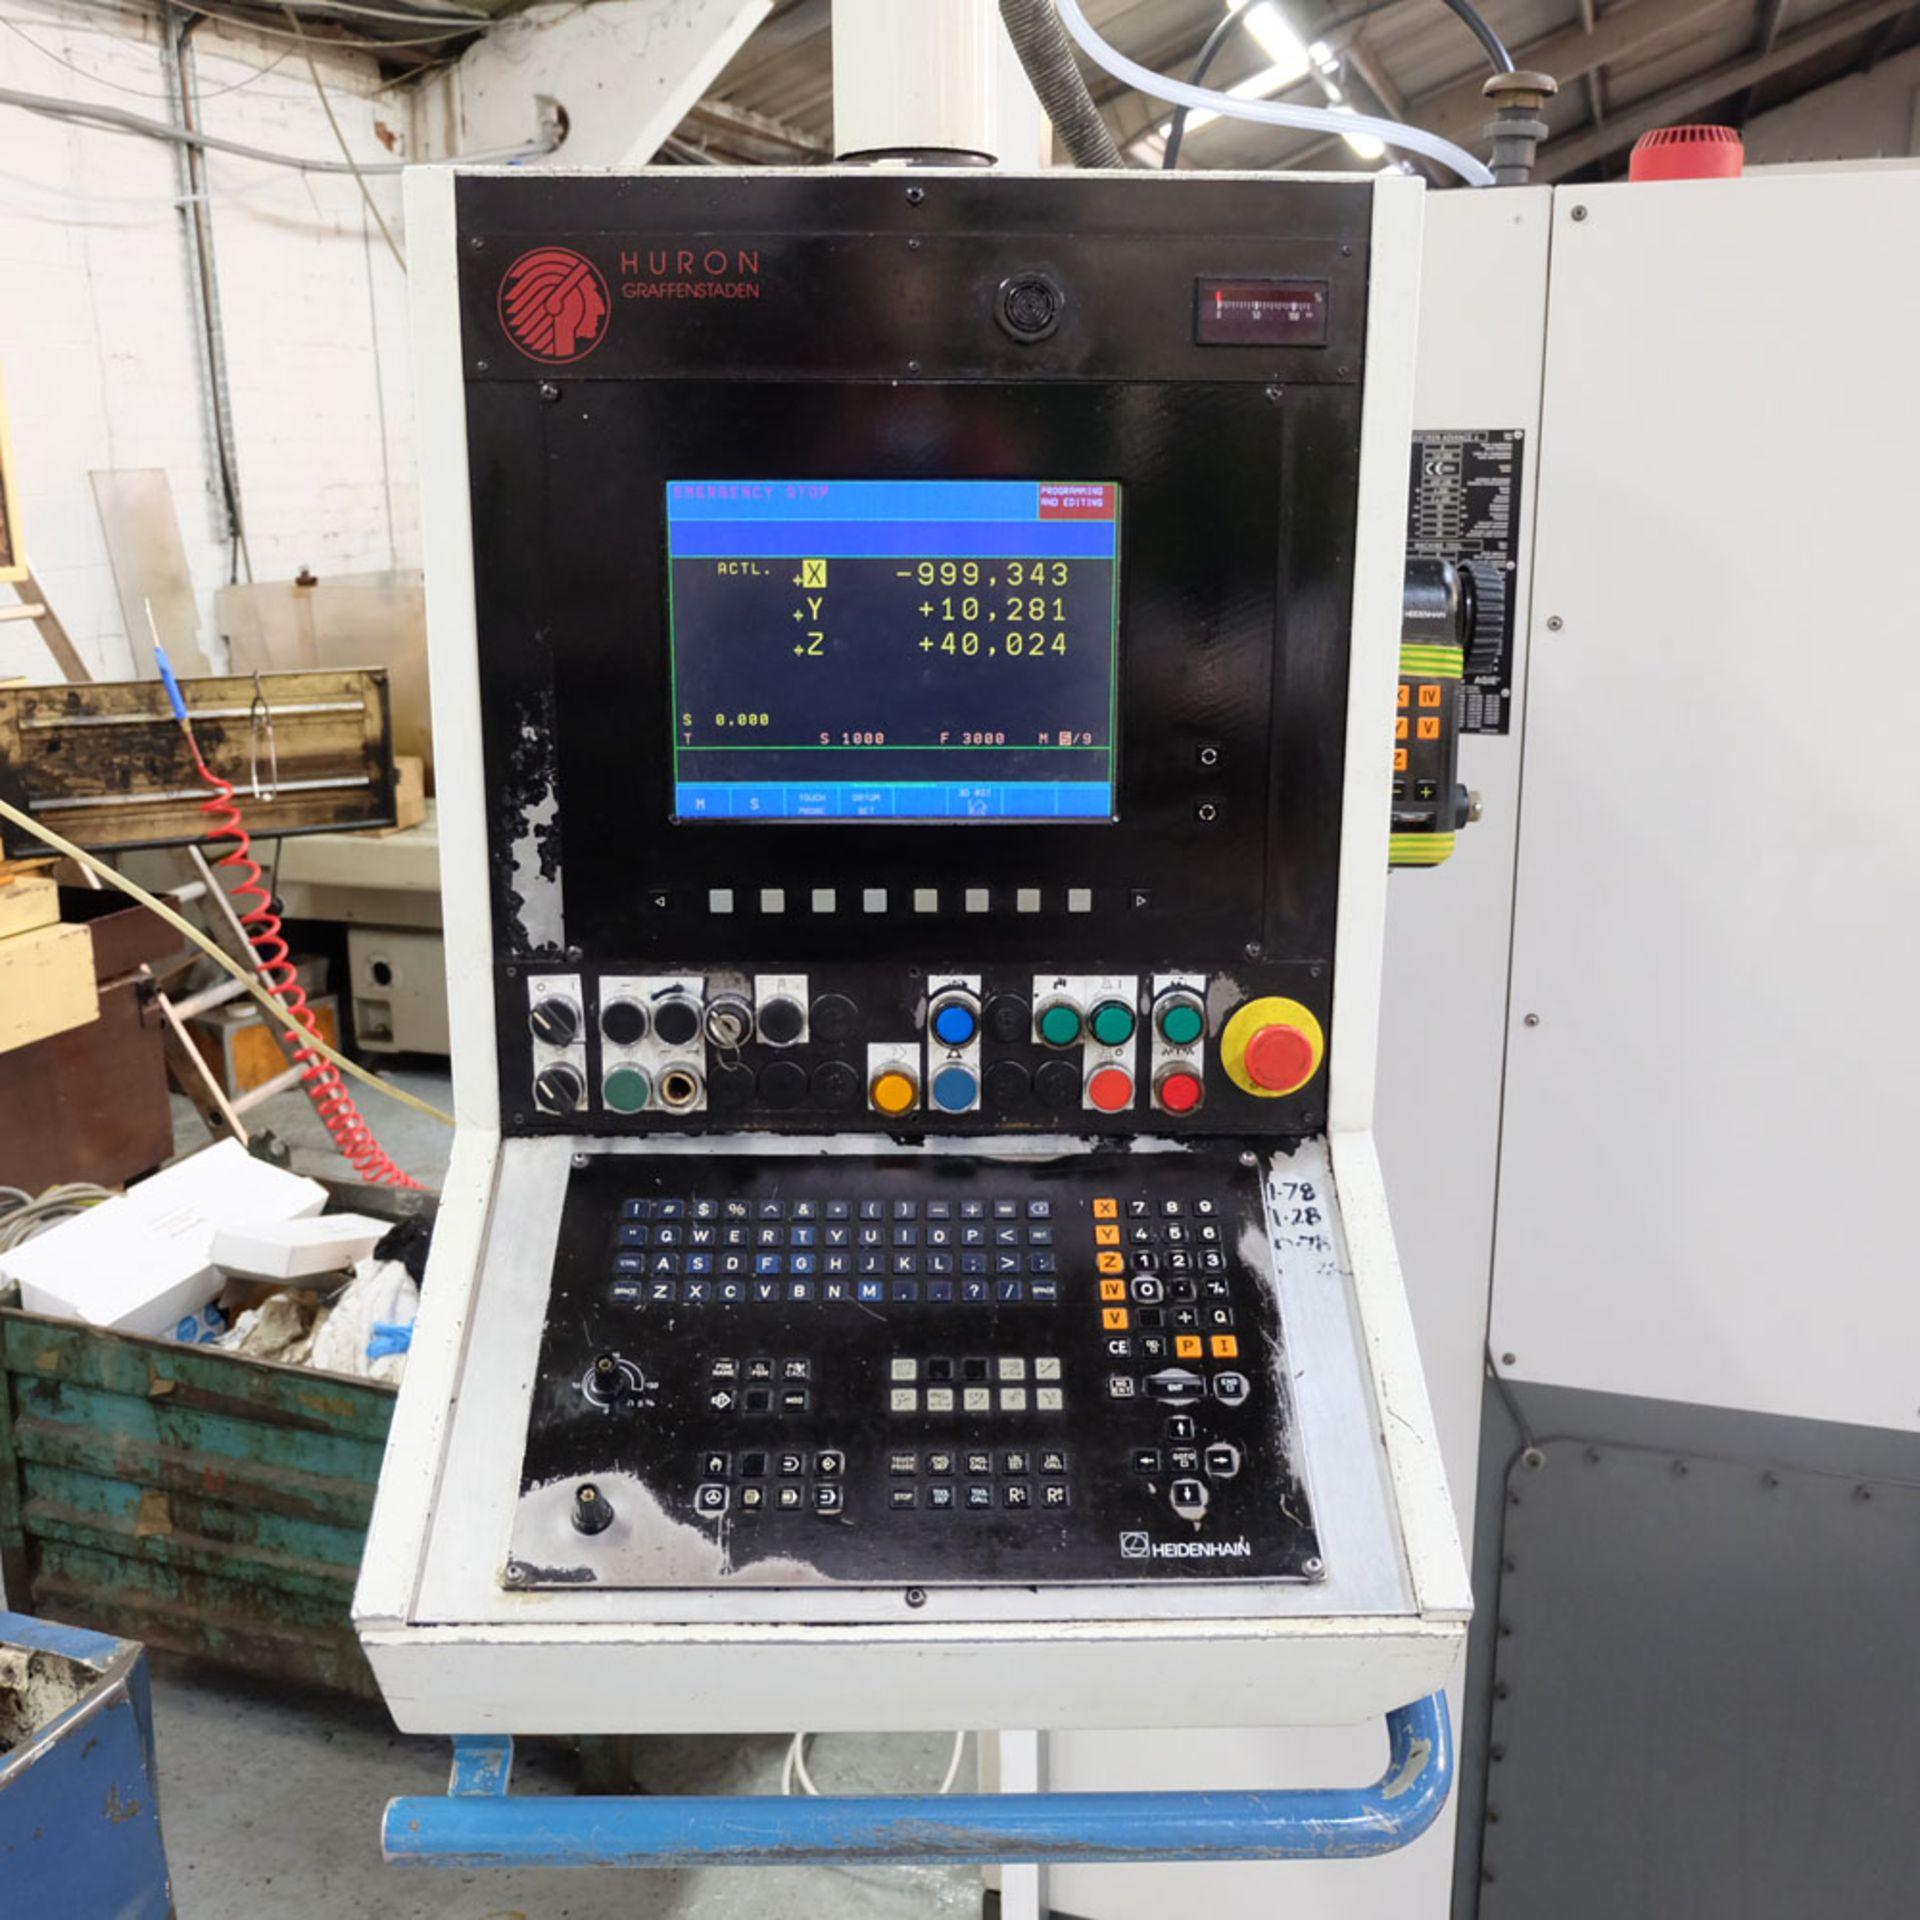 Huron GX 411 F Bed Type Milling Machine. Control Unit: CNC (HEIDENHAIN TNC 415B) - Image 7 of 12